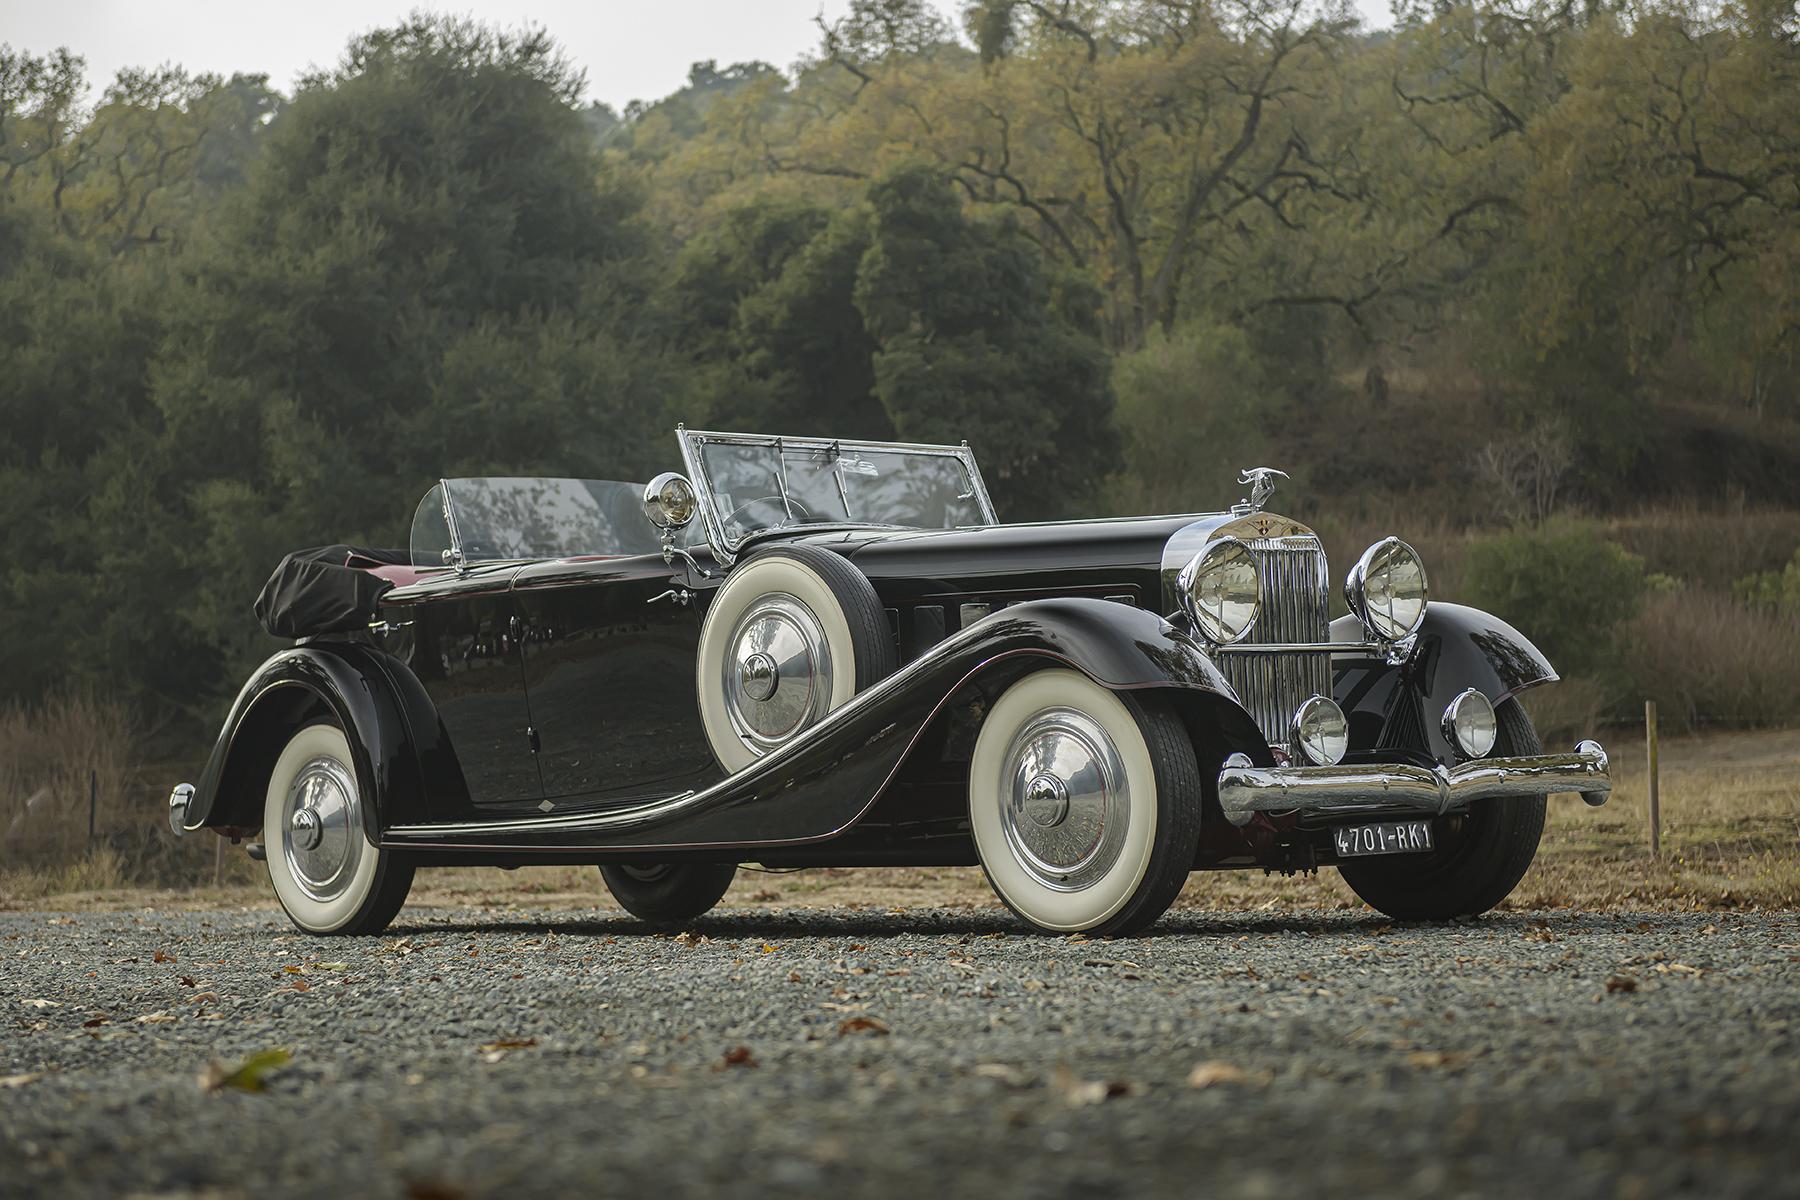 Gooding's, An elegant lineup of prewar classics at Gooding's 2020 Scottsdale sale, ClassicCars.com Journal